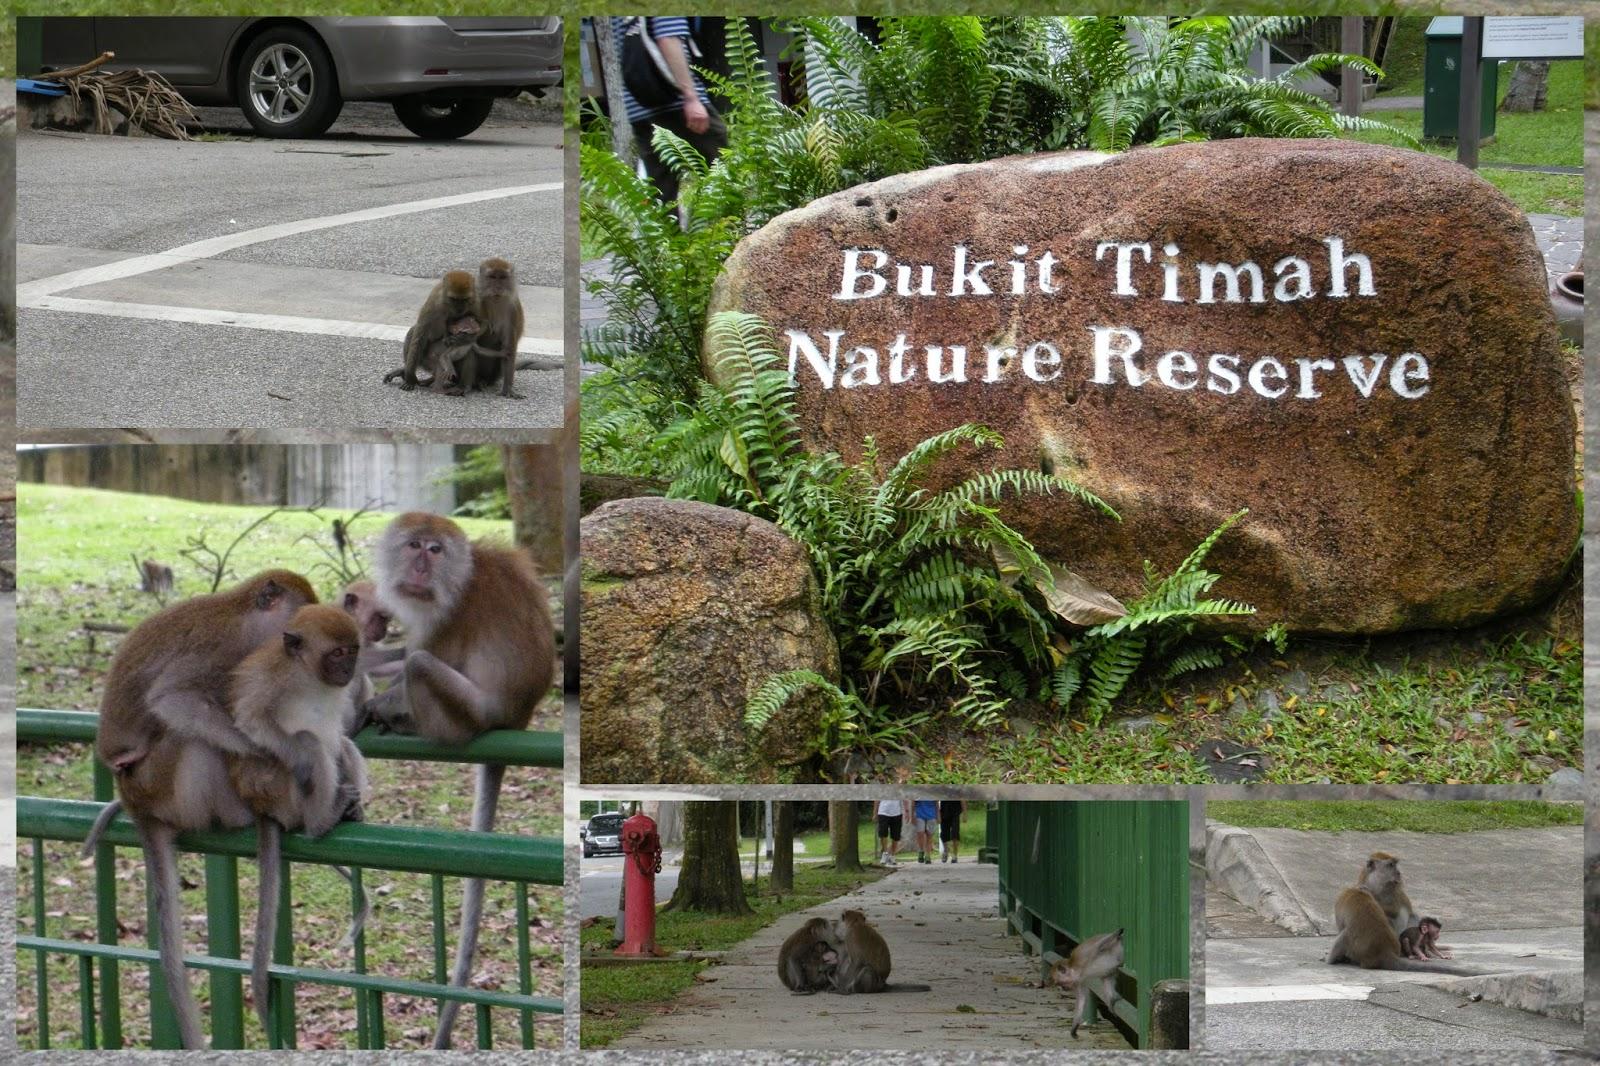 Monkeys - Bukit Timah